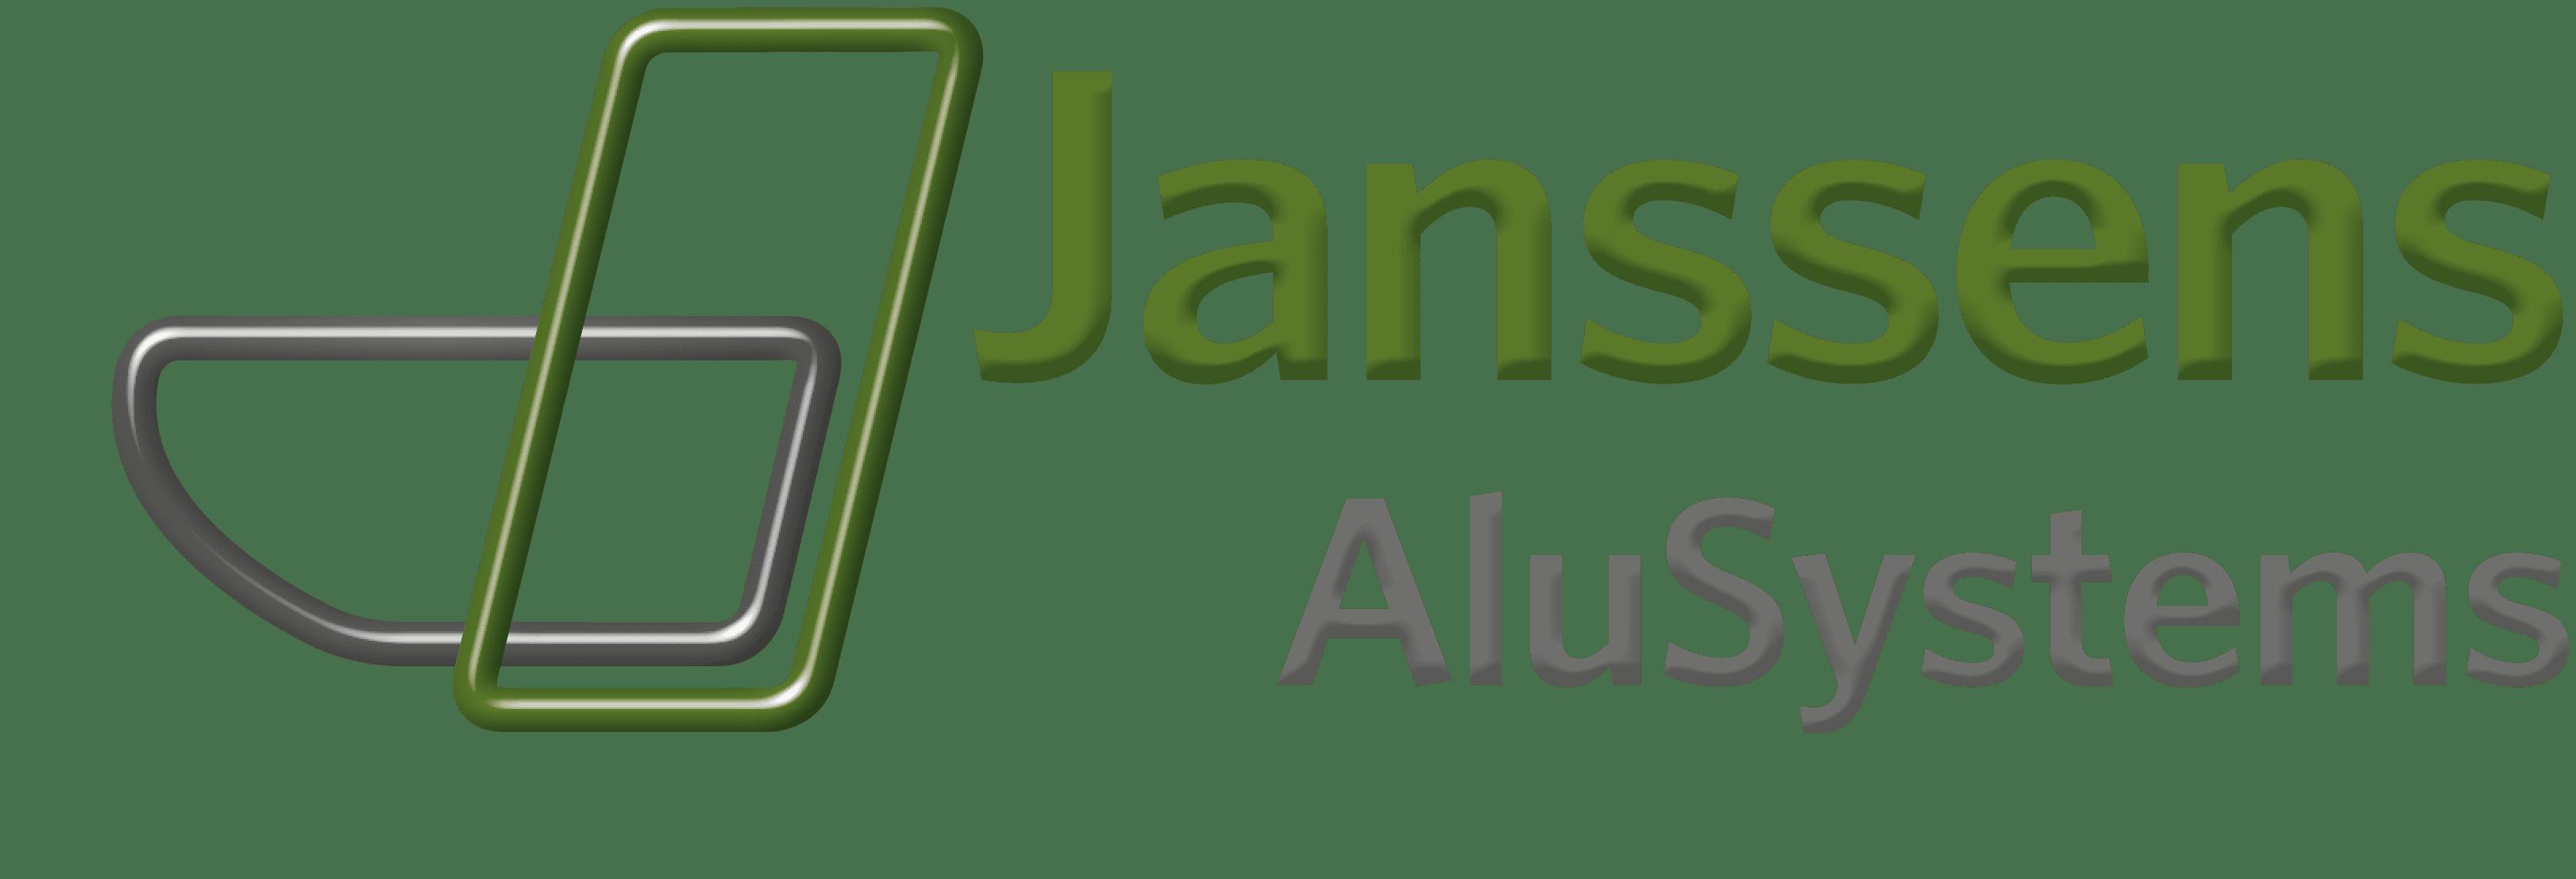 Janssens